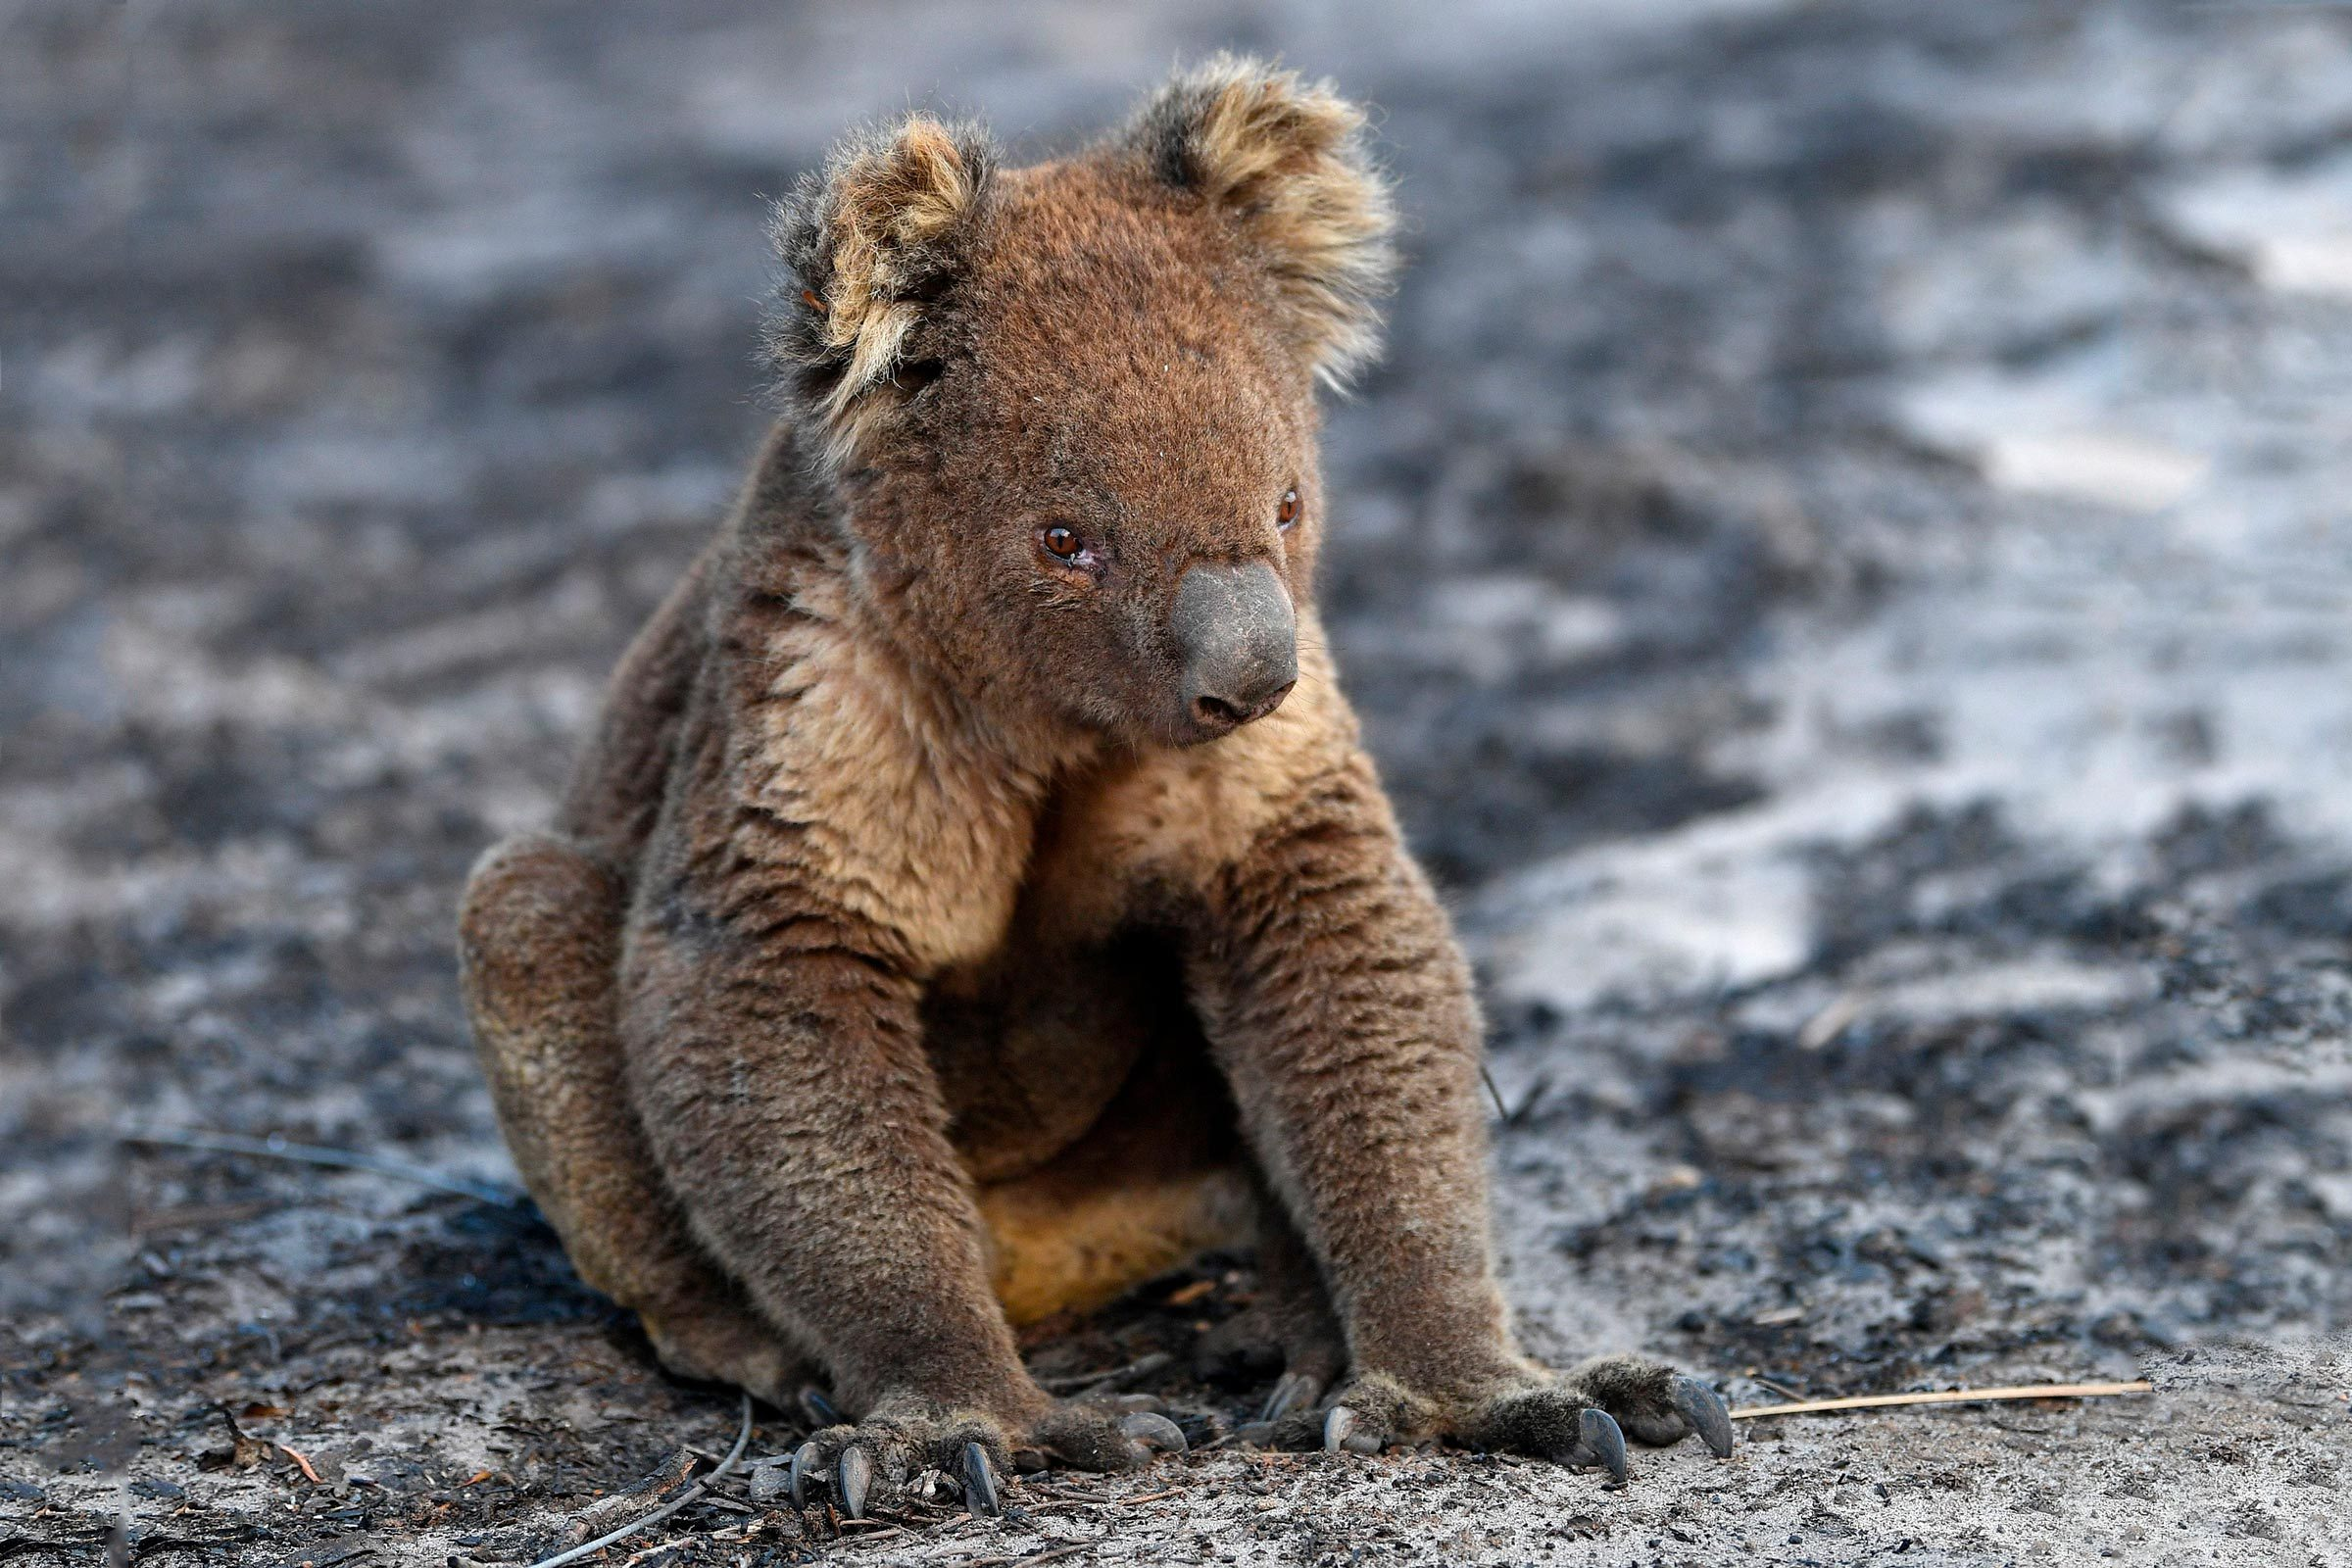 An injured Koala is seen at a forest near Cape Borda on Kangaroo Island, southwest of Adelaide, Australia, 07 January 2020